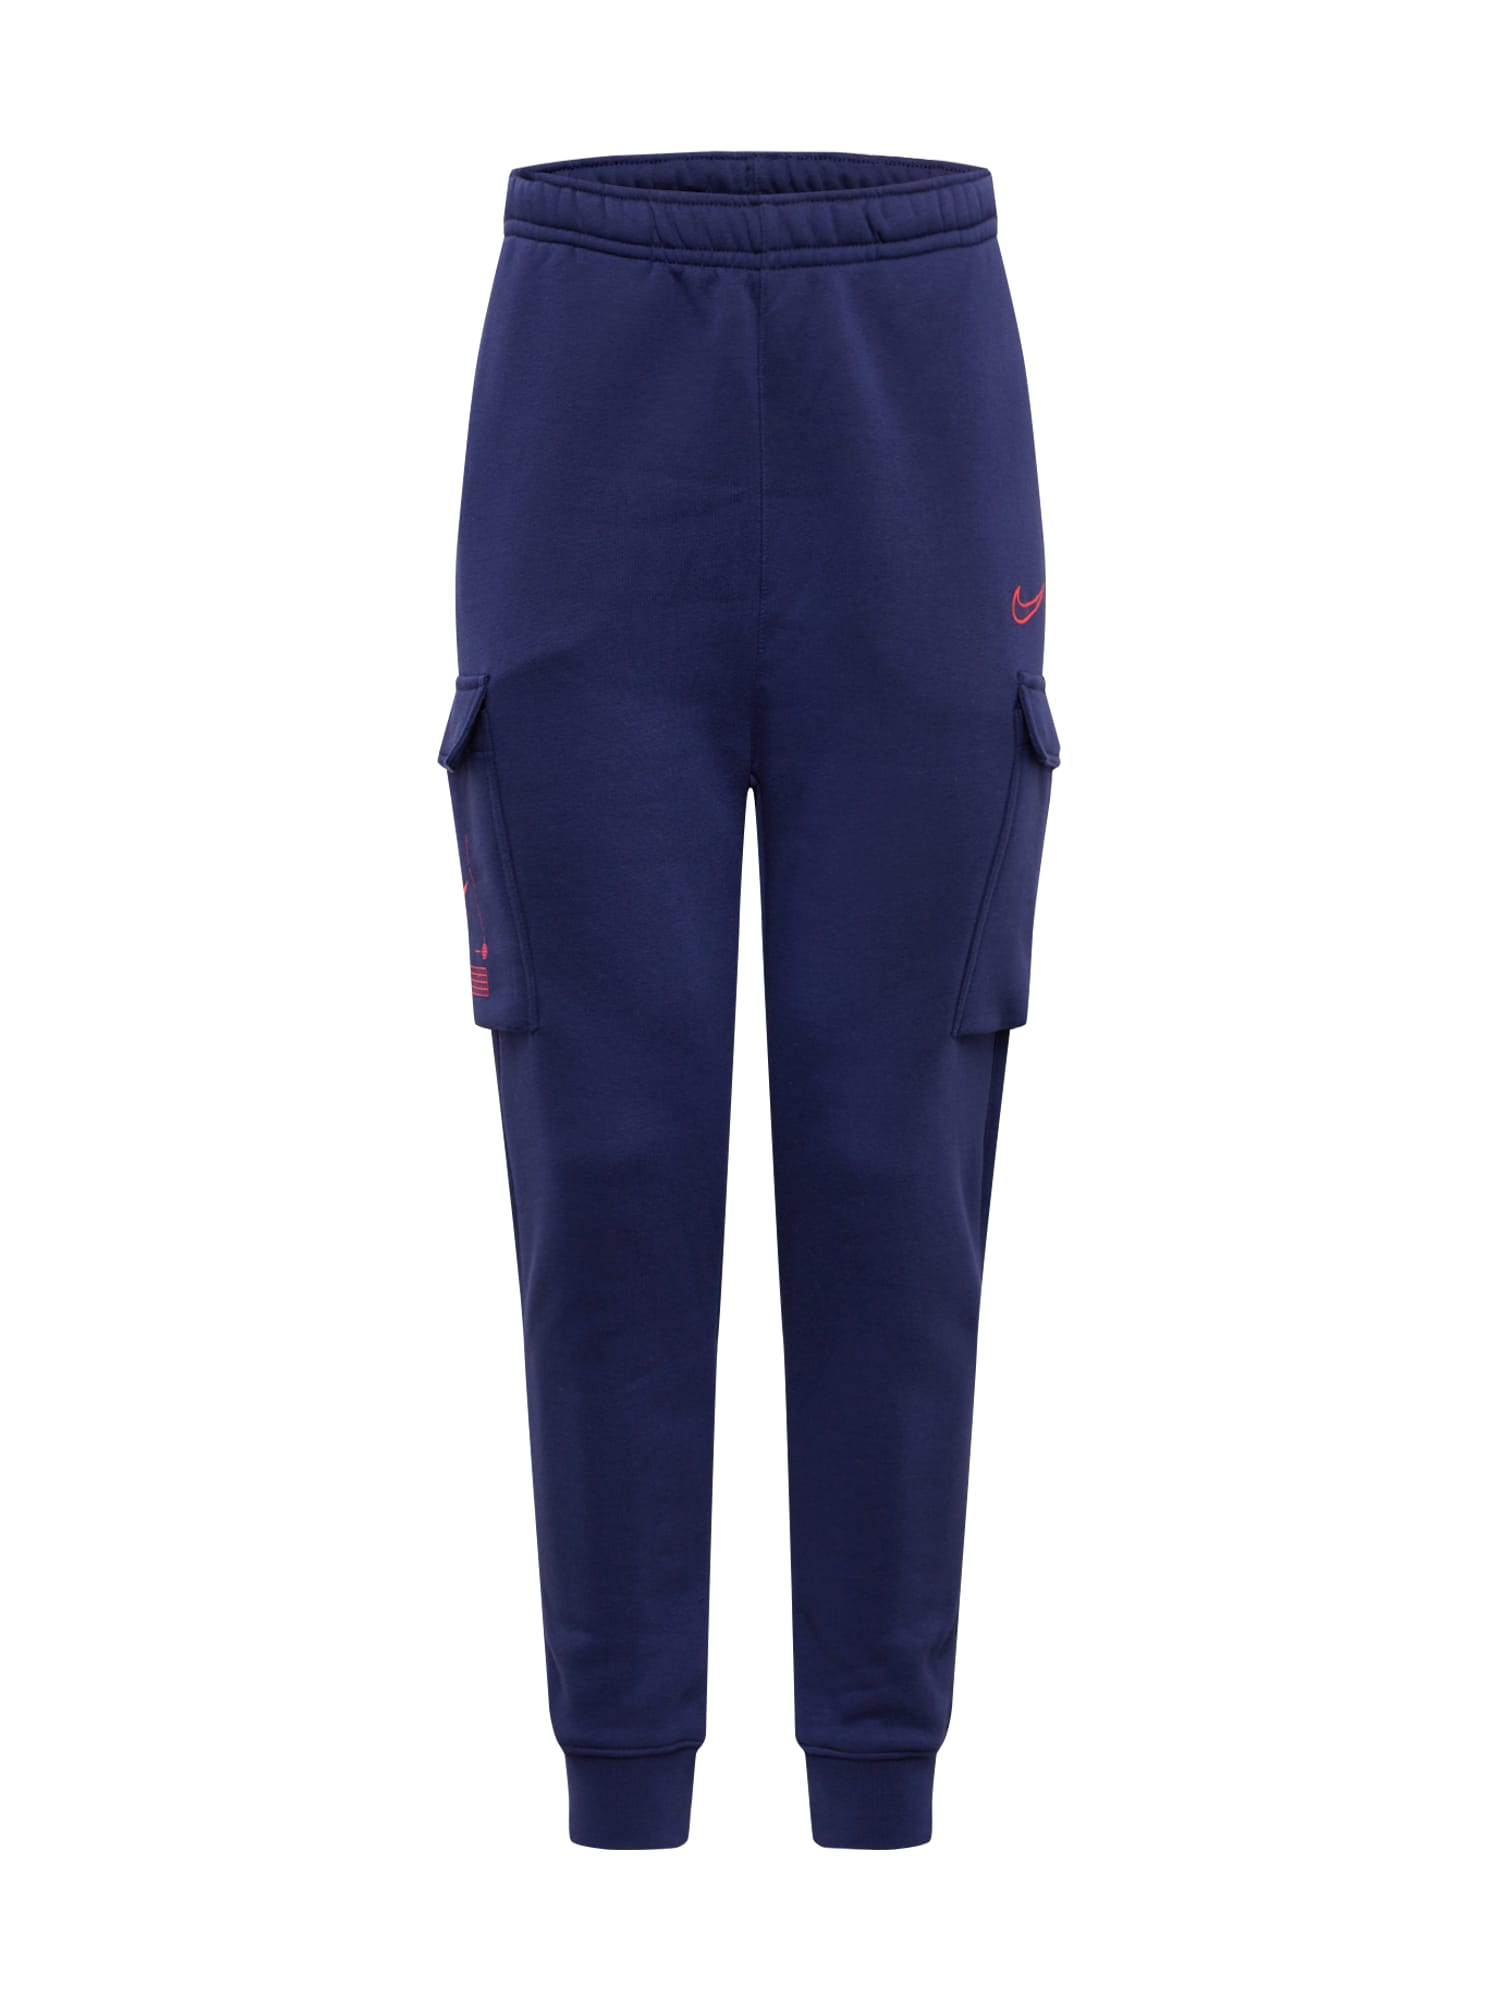 Nike Sportswear Laisvo stiliaus kelnės tamsiai mėlyna